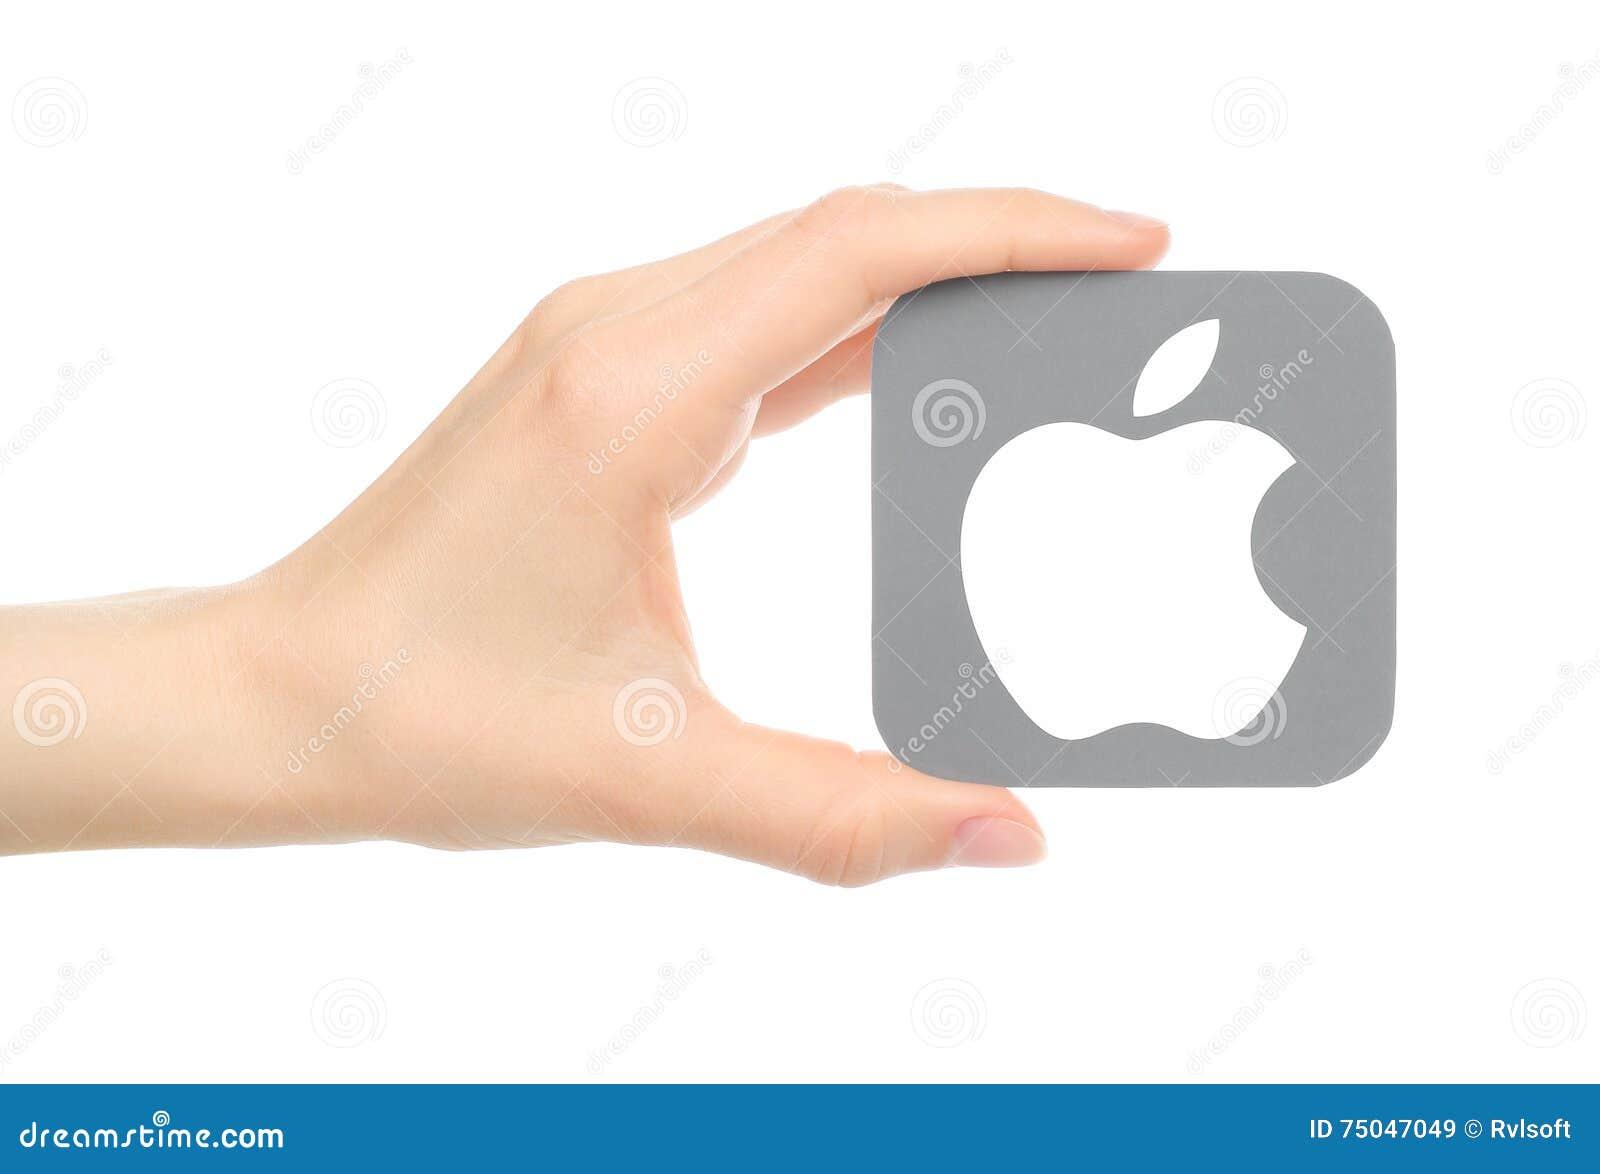 рука на жопе фото